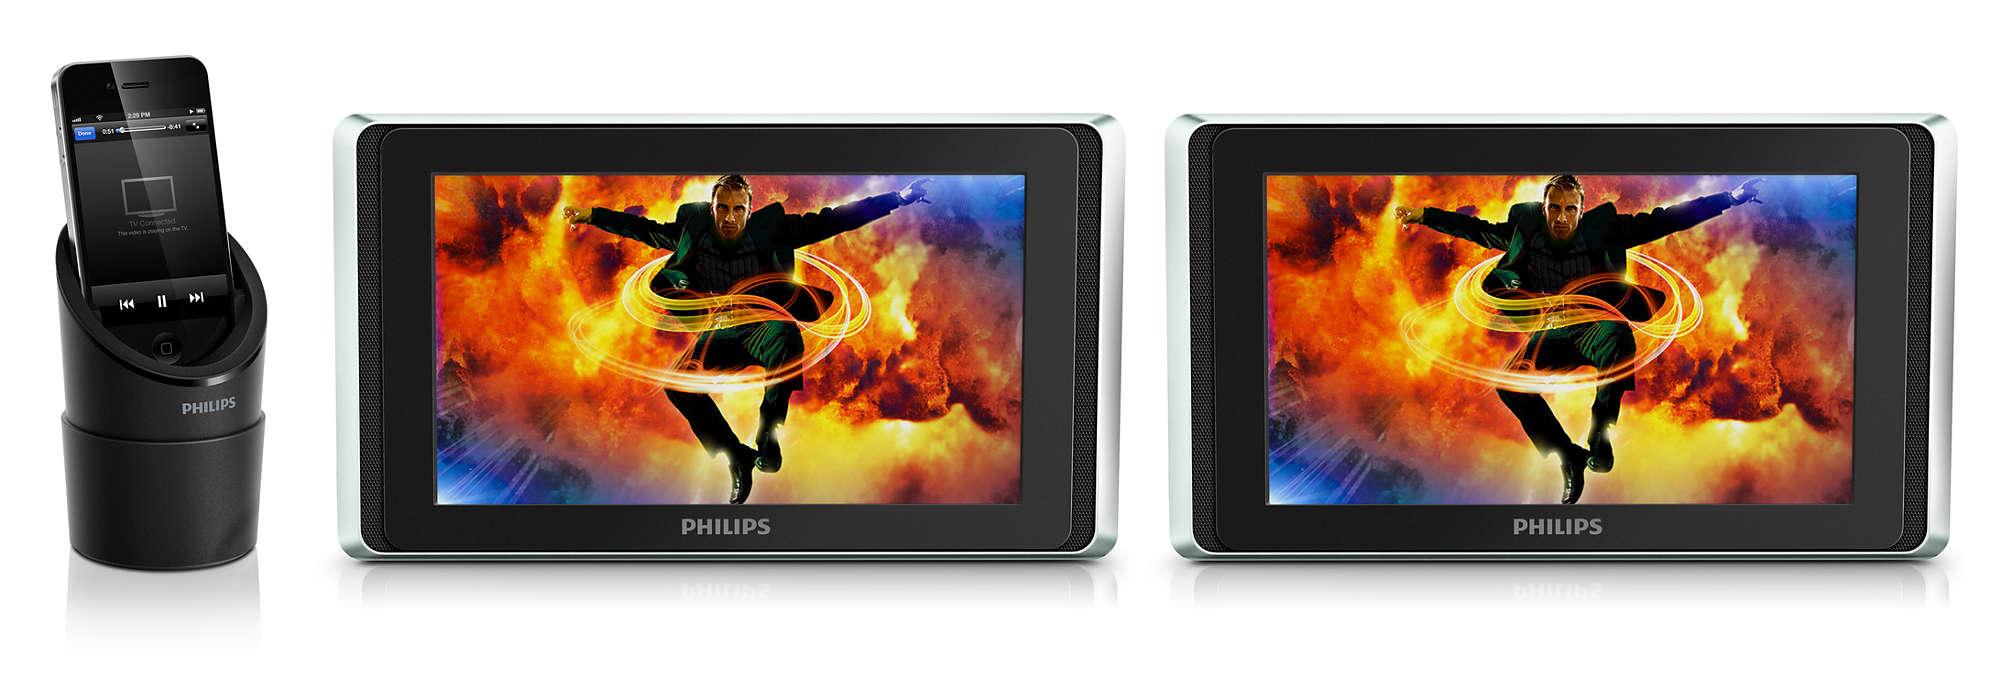 Užijte si video ziPodu/iPhonu/iPadu vautě